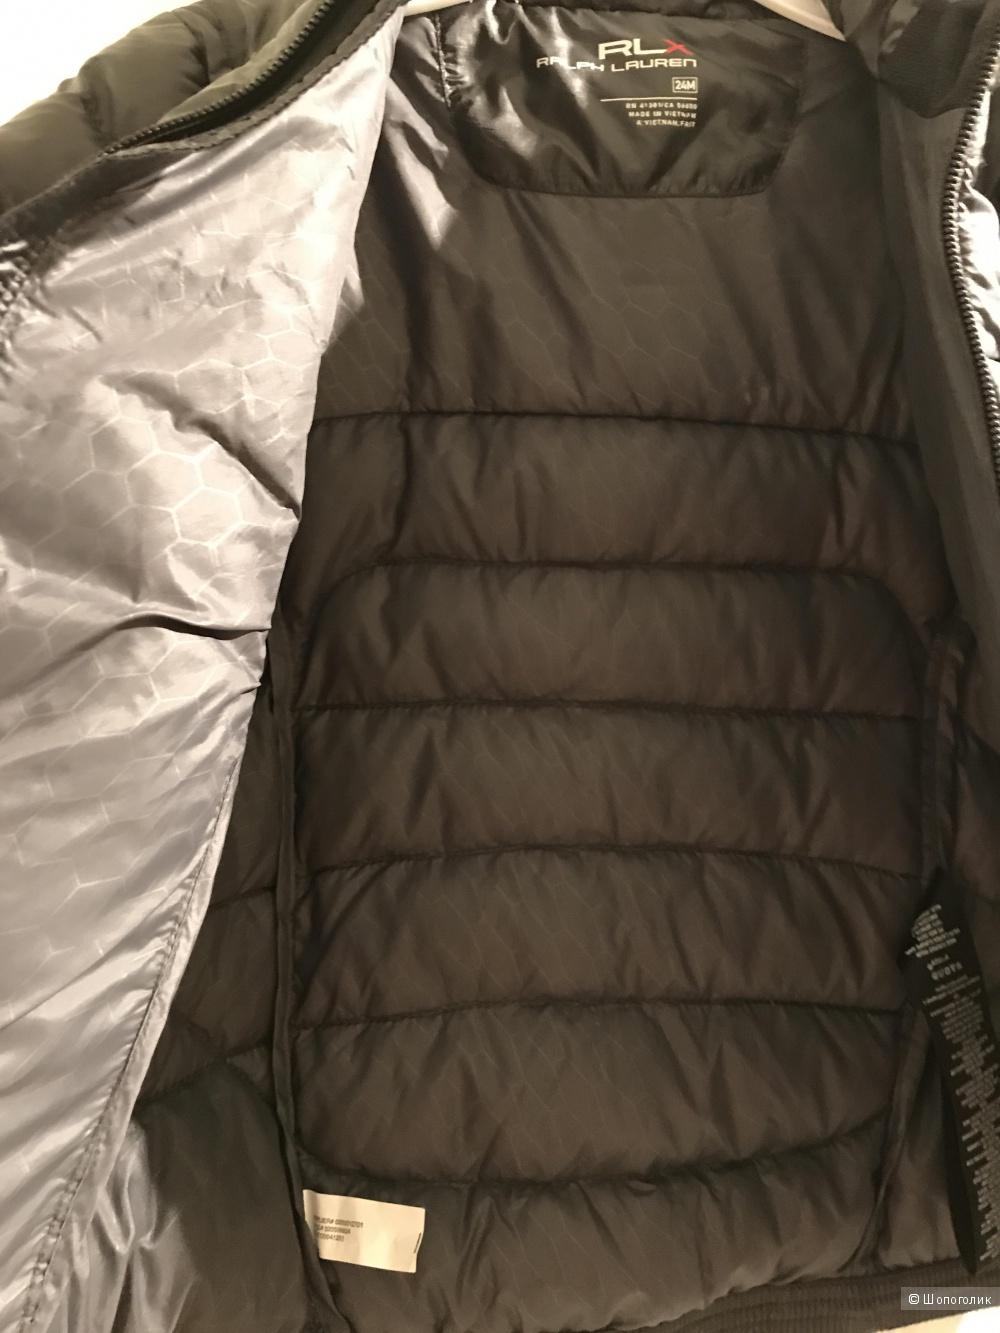 Куртка Ralph Lauren RLX размер 24мес.